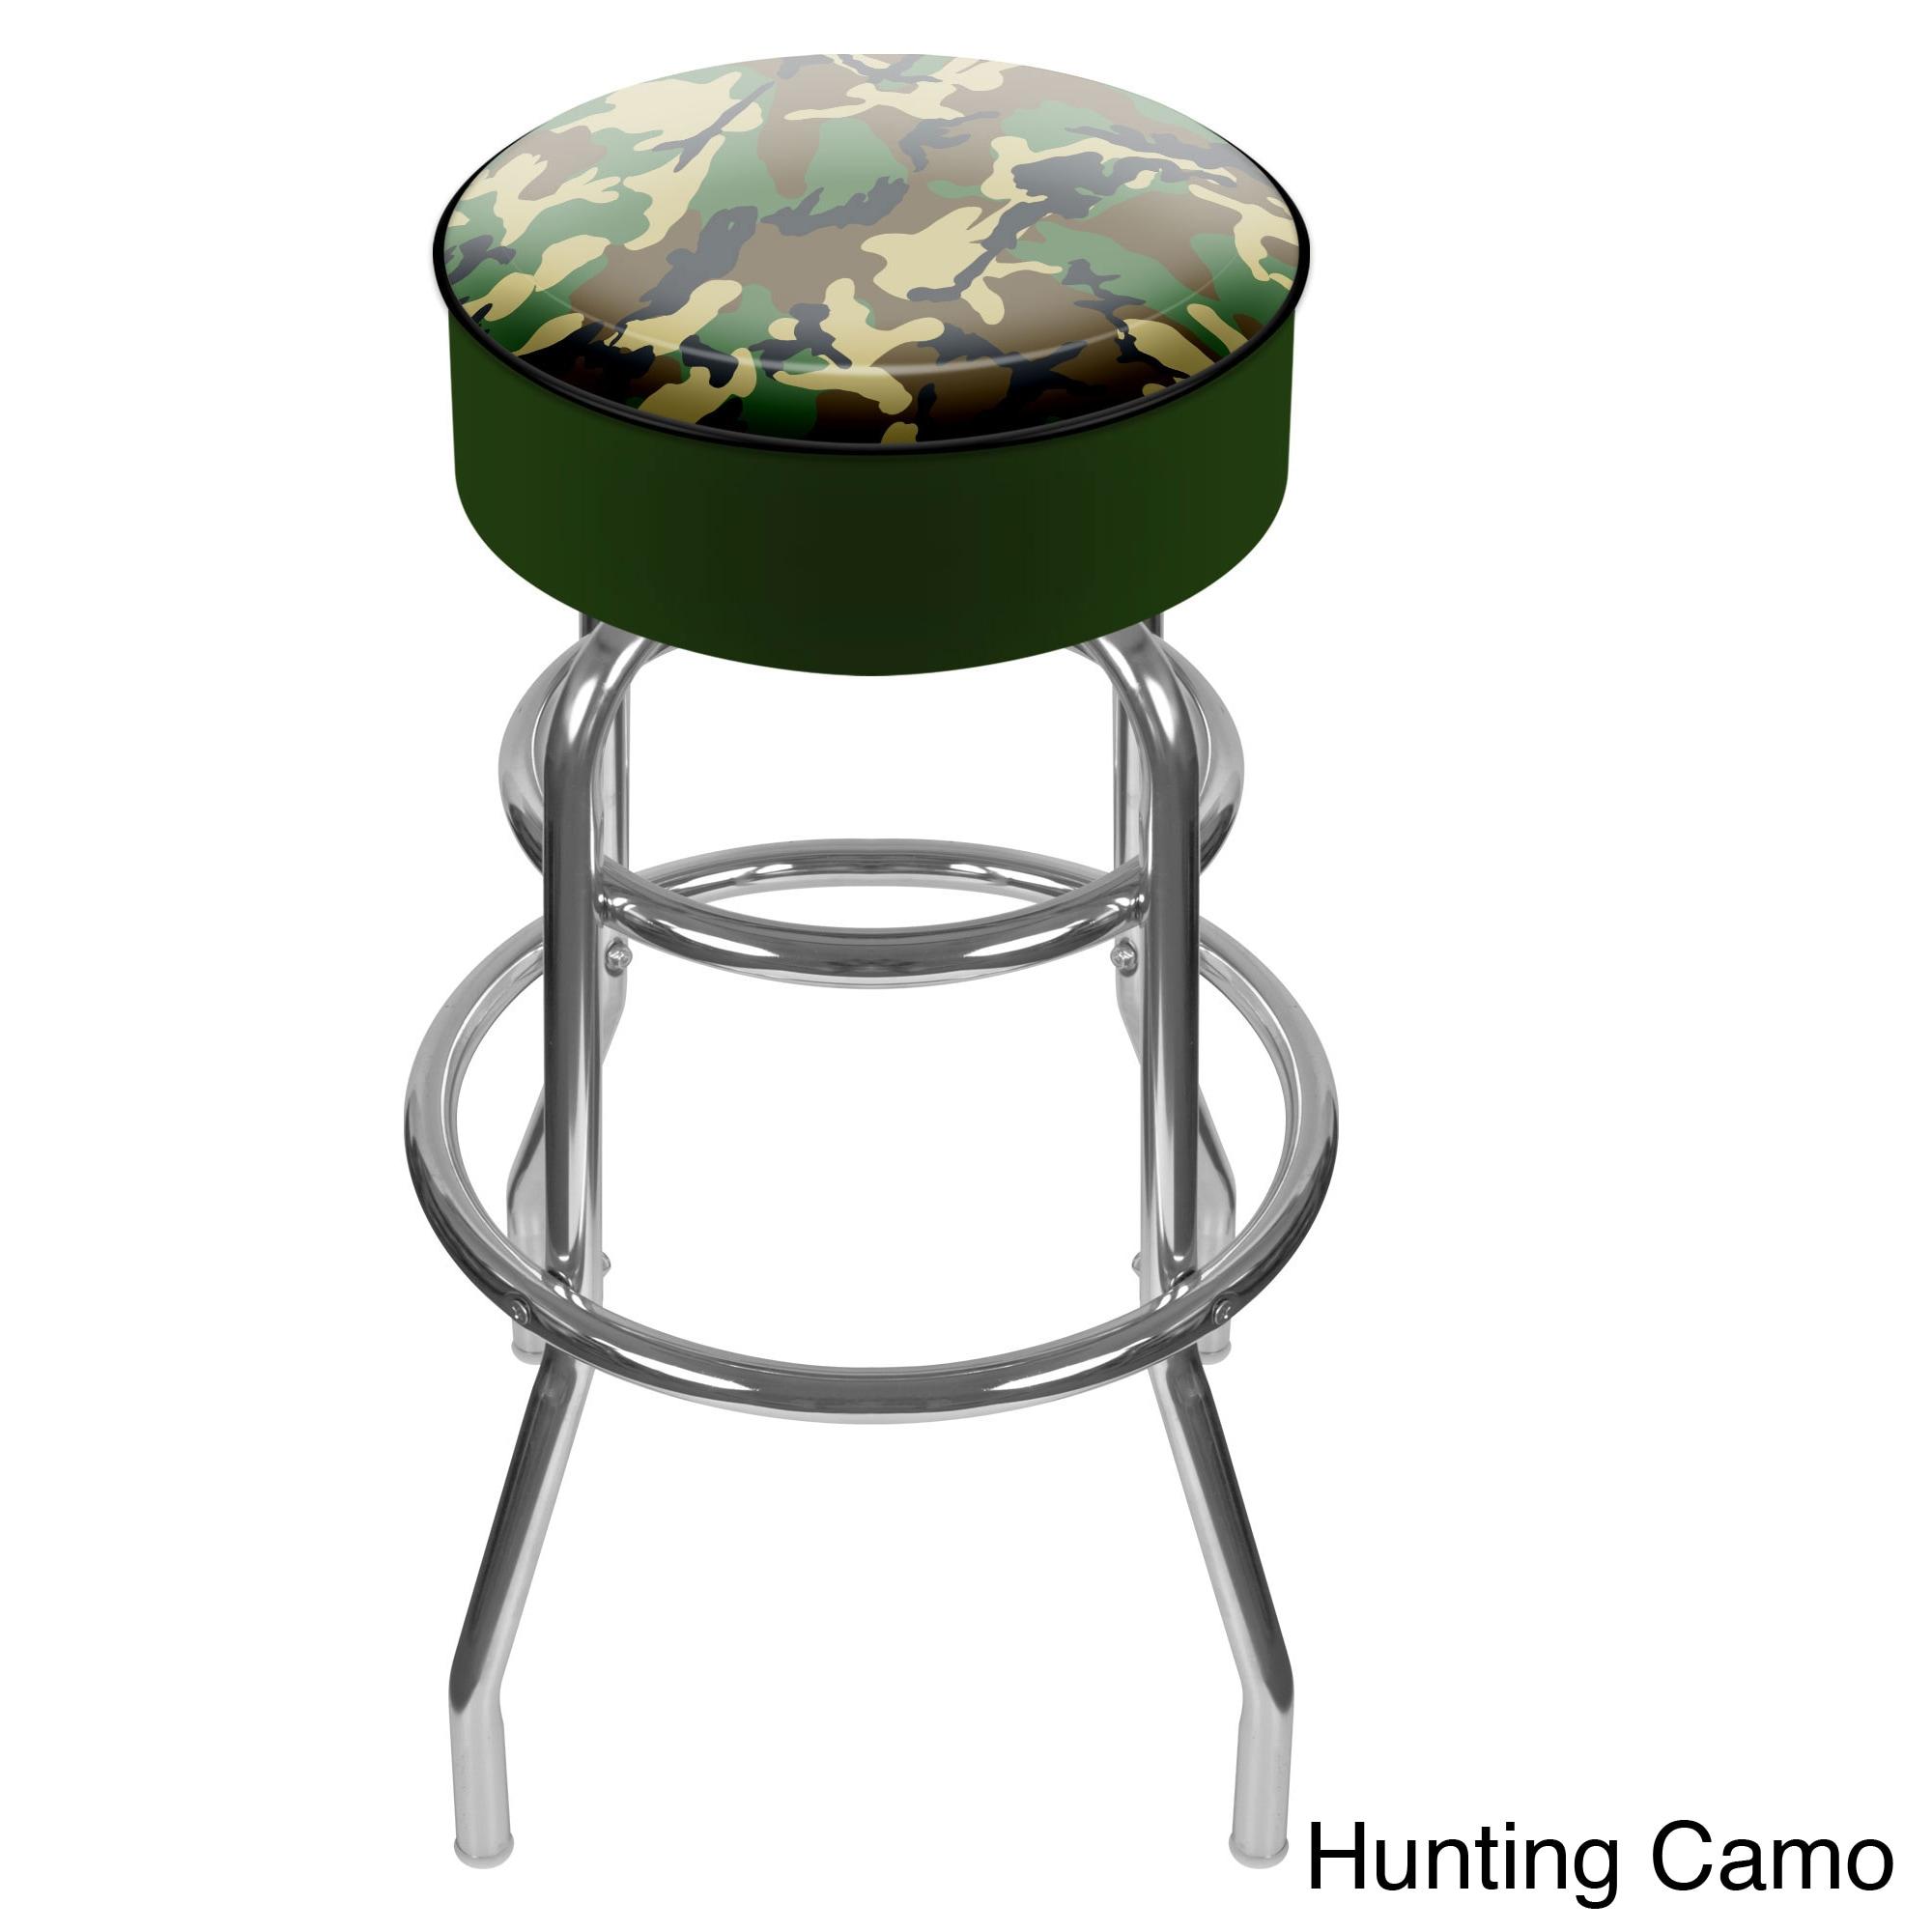 Swivel hunting chair